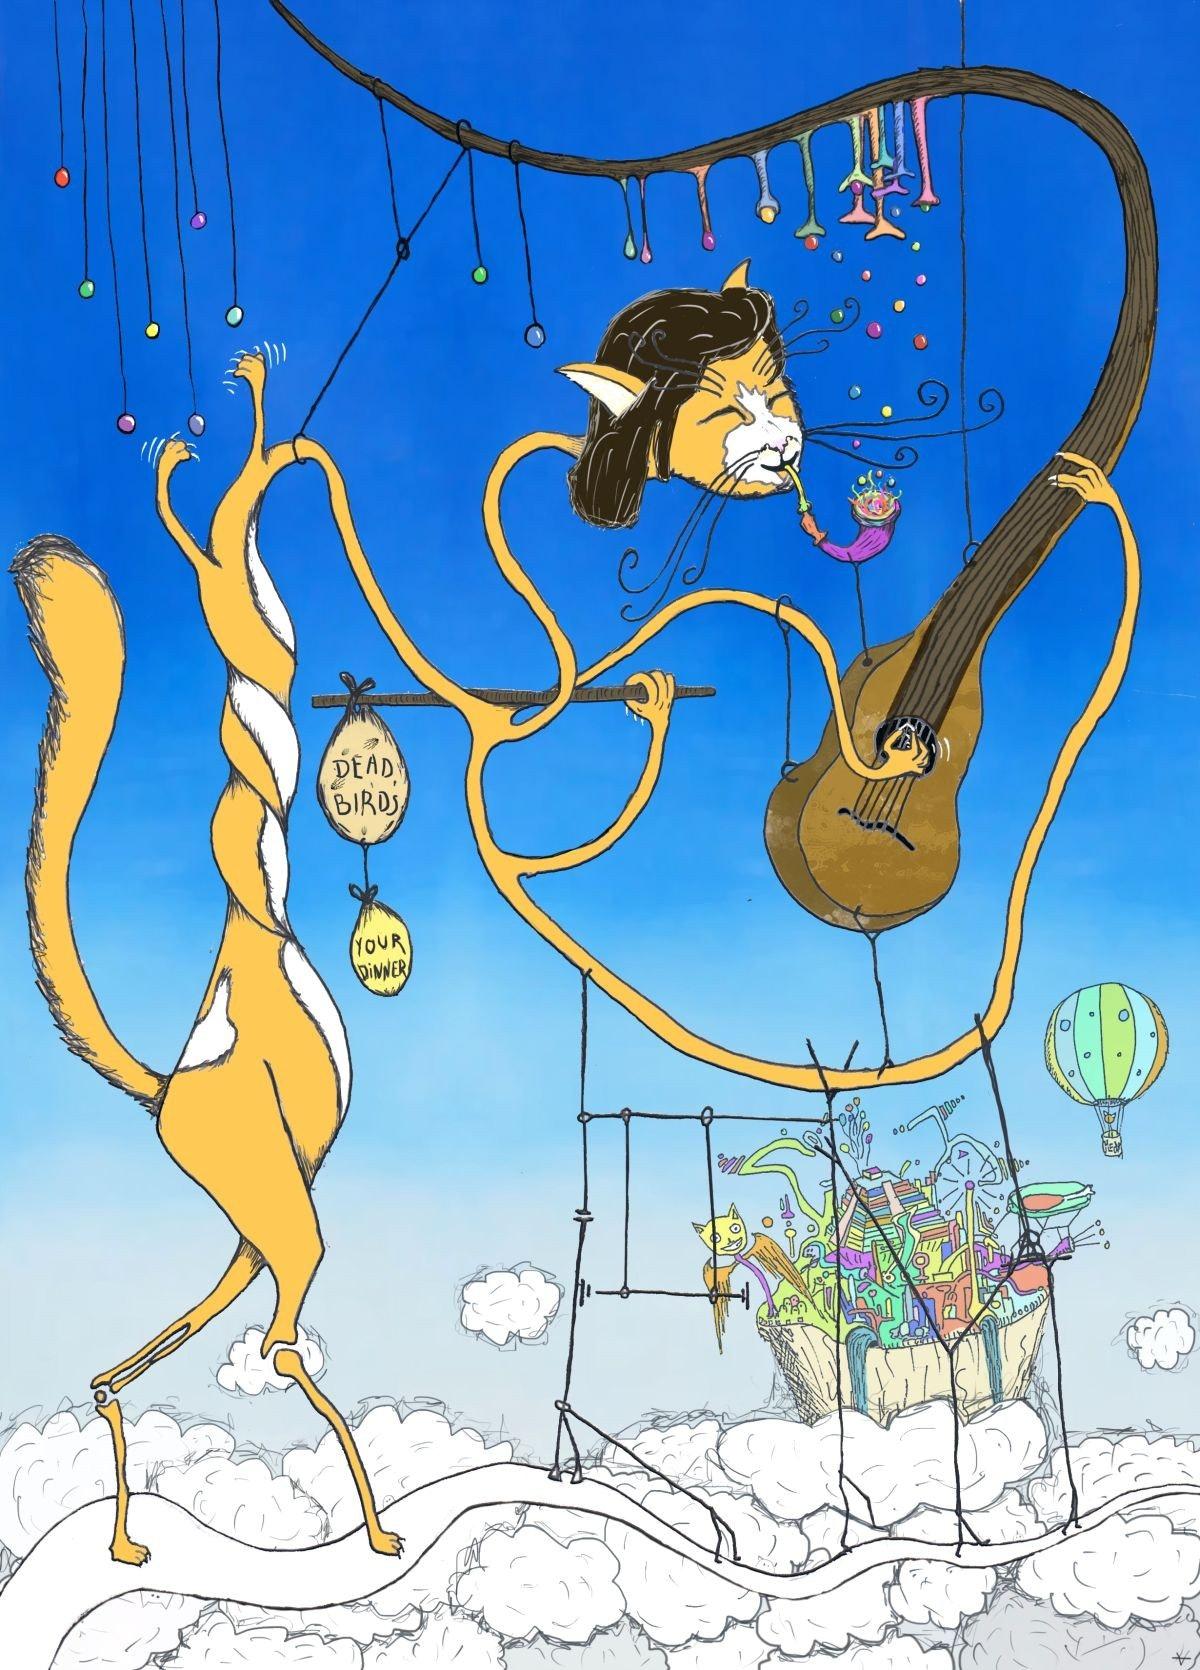 dream-like magical cat